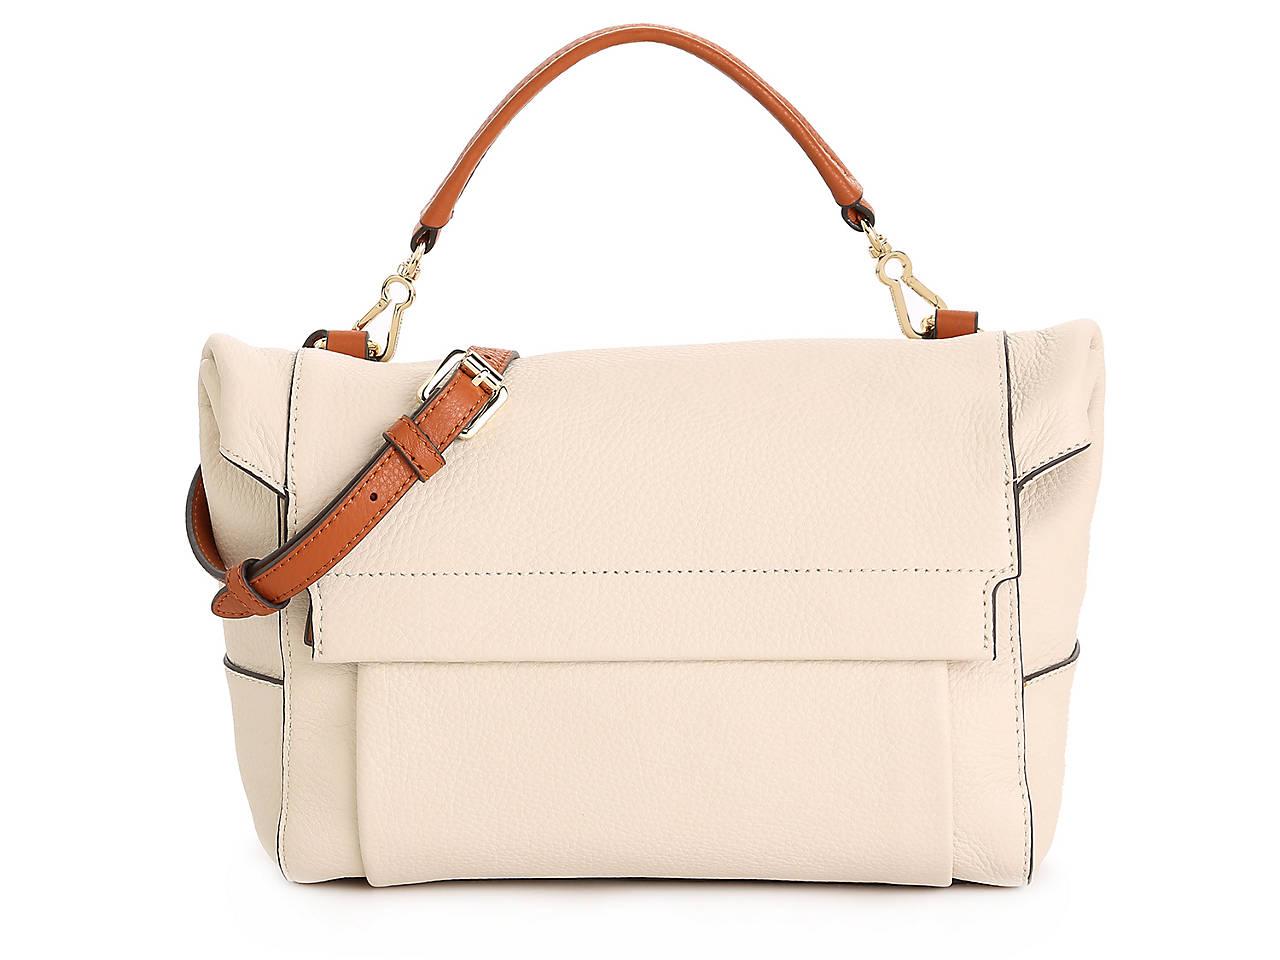 41f312cb6 Vince Camuto Min Leather Crossbody Bag Women's Handbags ...